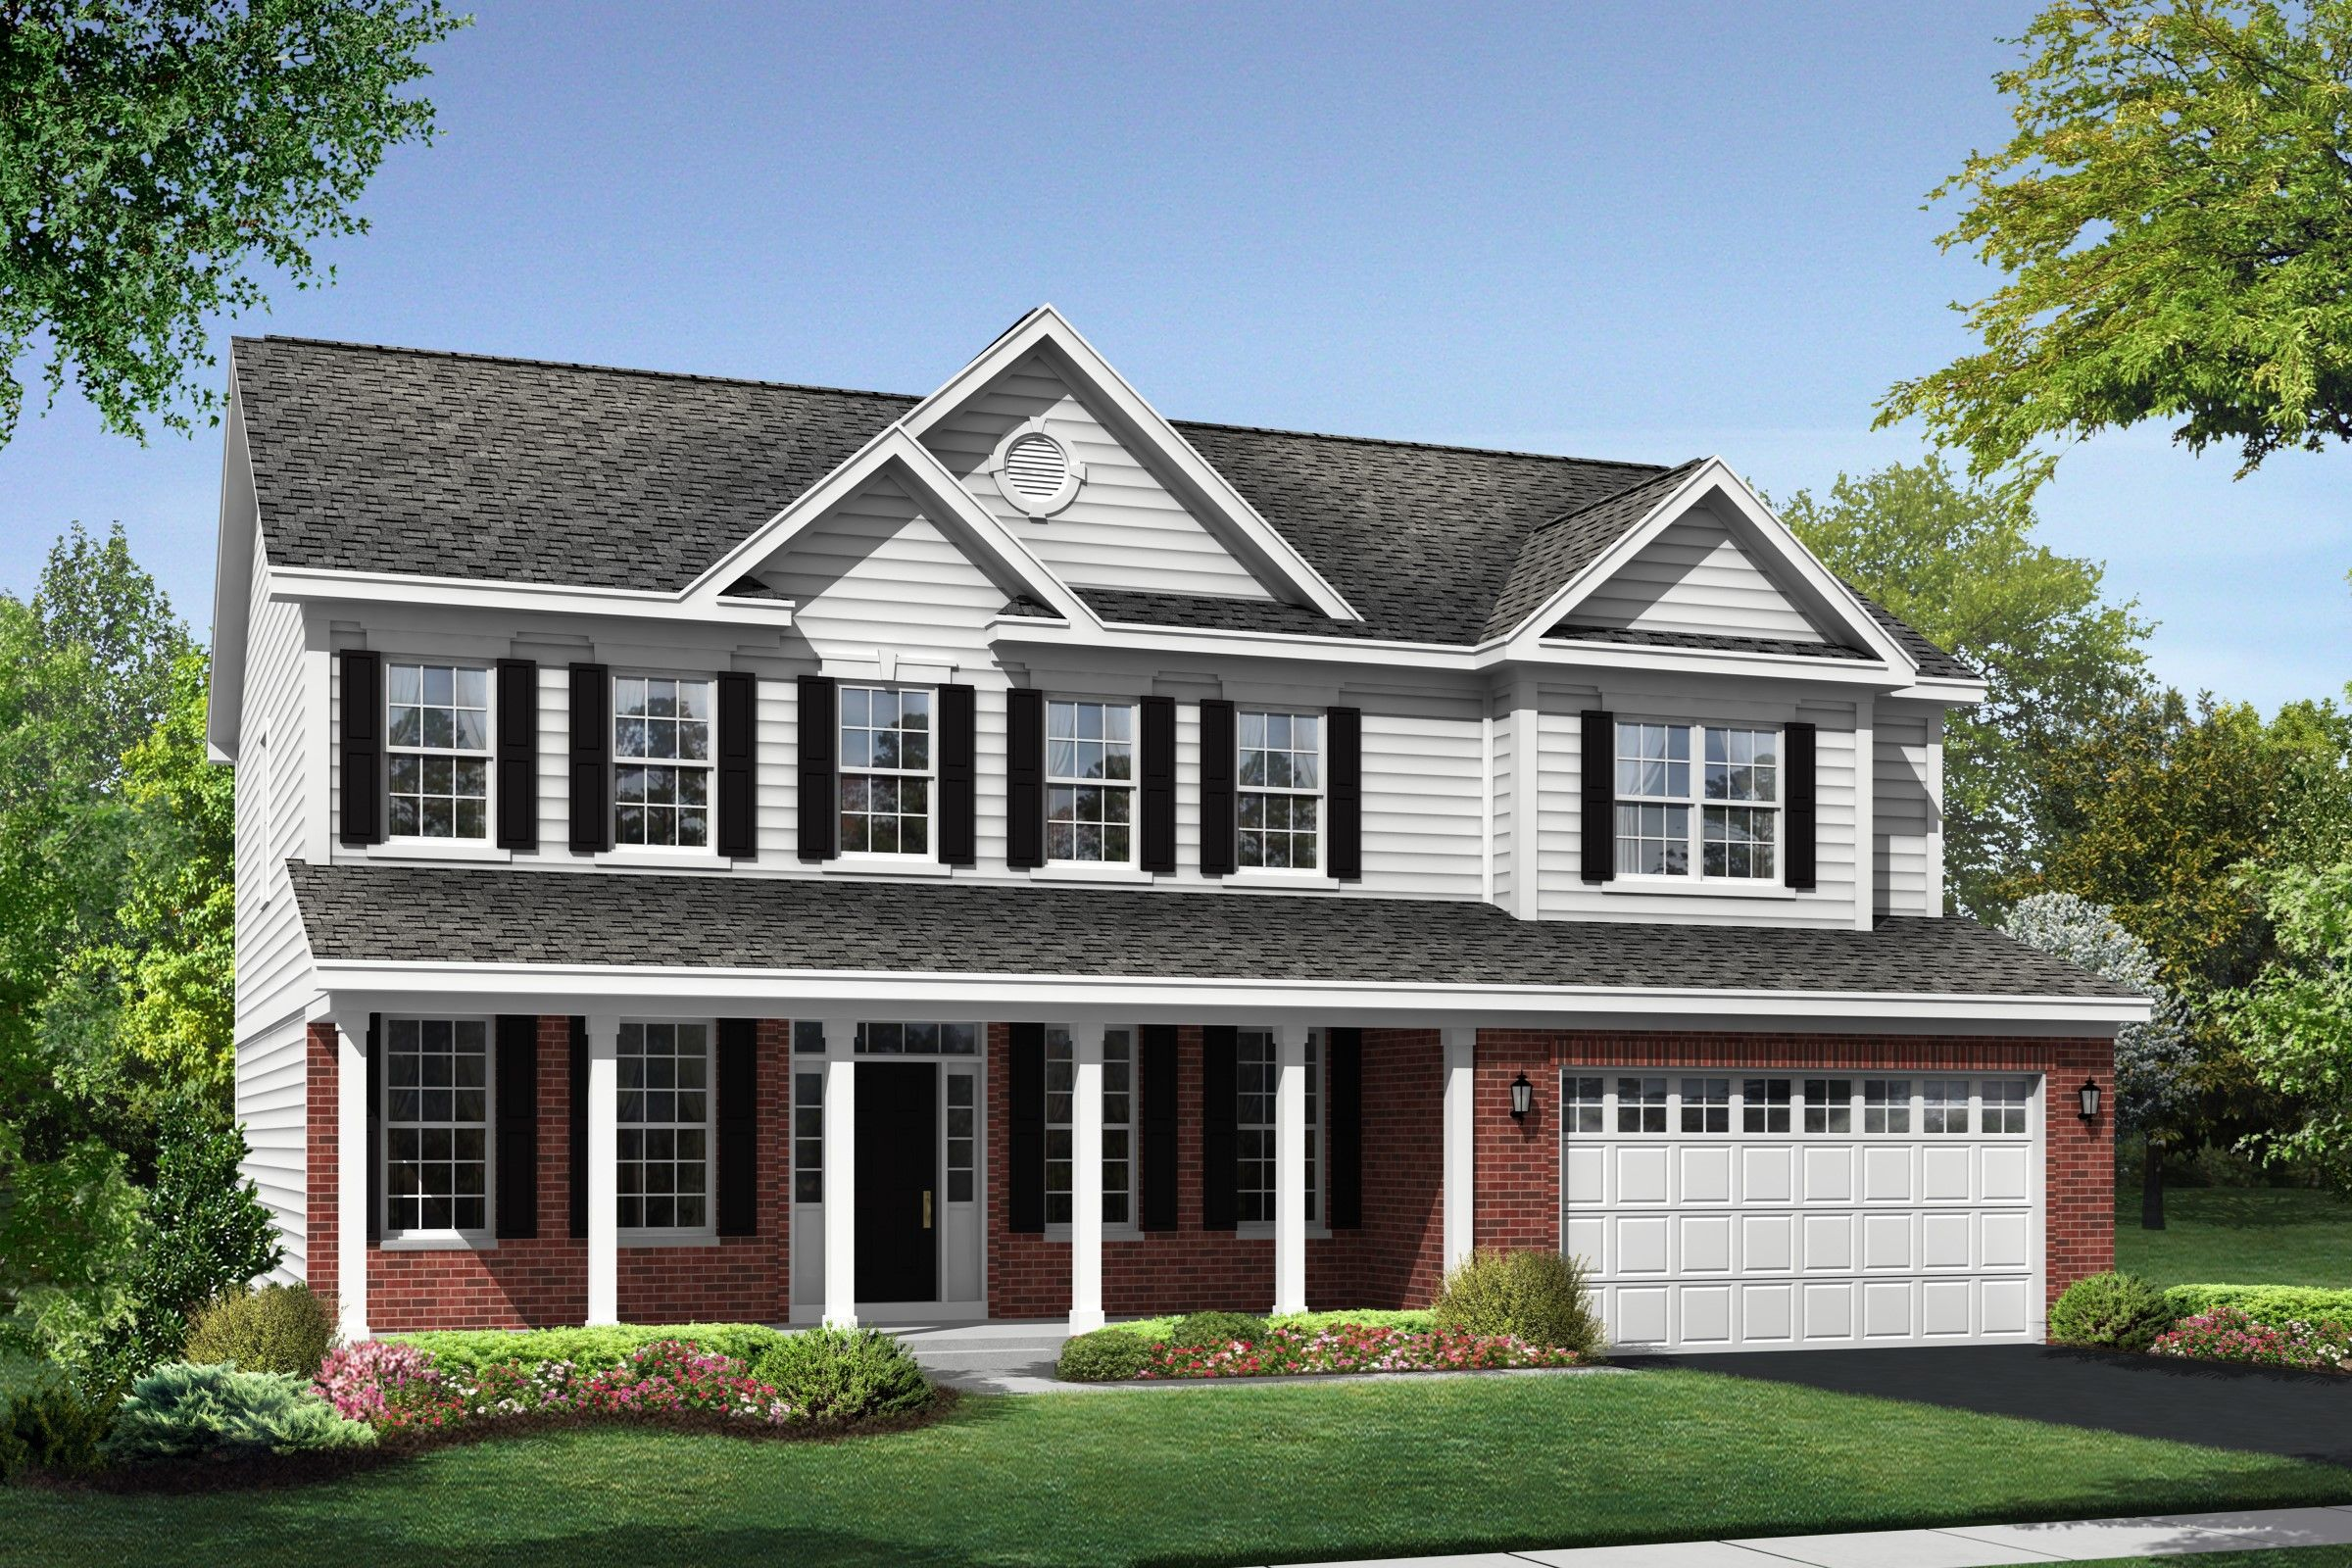 Single Family for Sale at Northridge Estates - Dover 1610 Falcon Drive Wheaton, Illinois 60187 United States